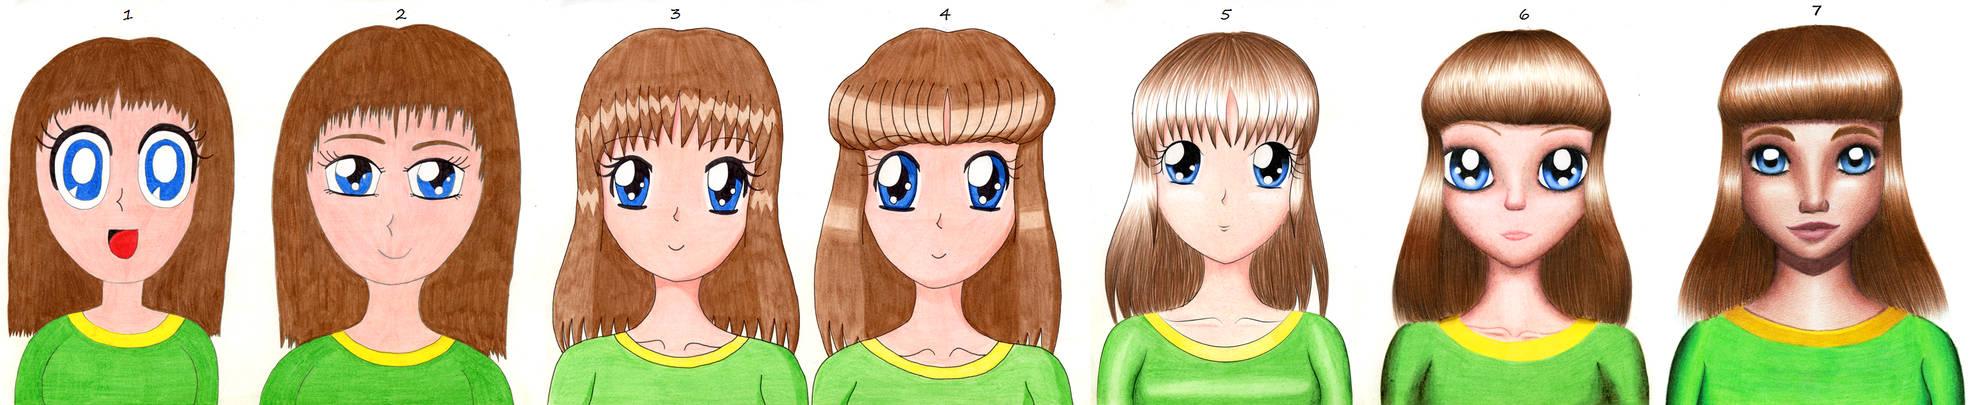 Style Development Updated 2016 by Chibi-Sugar